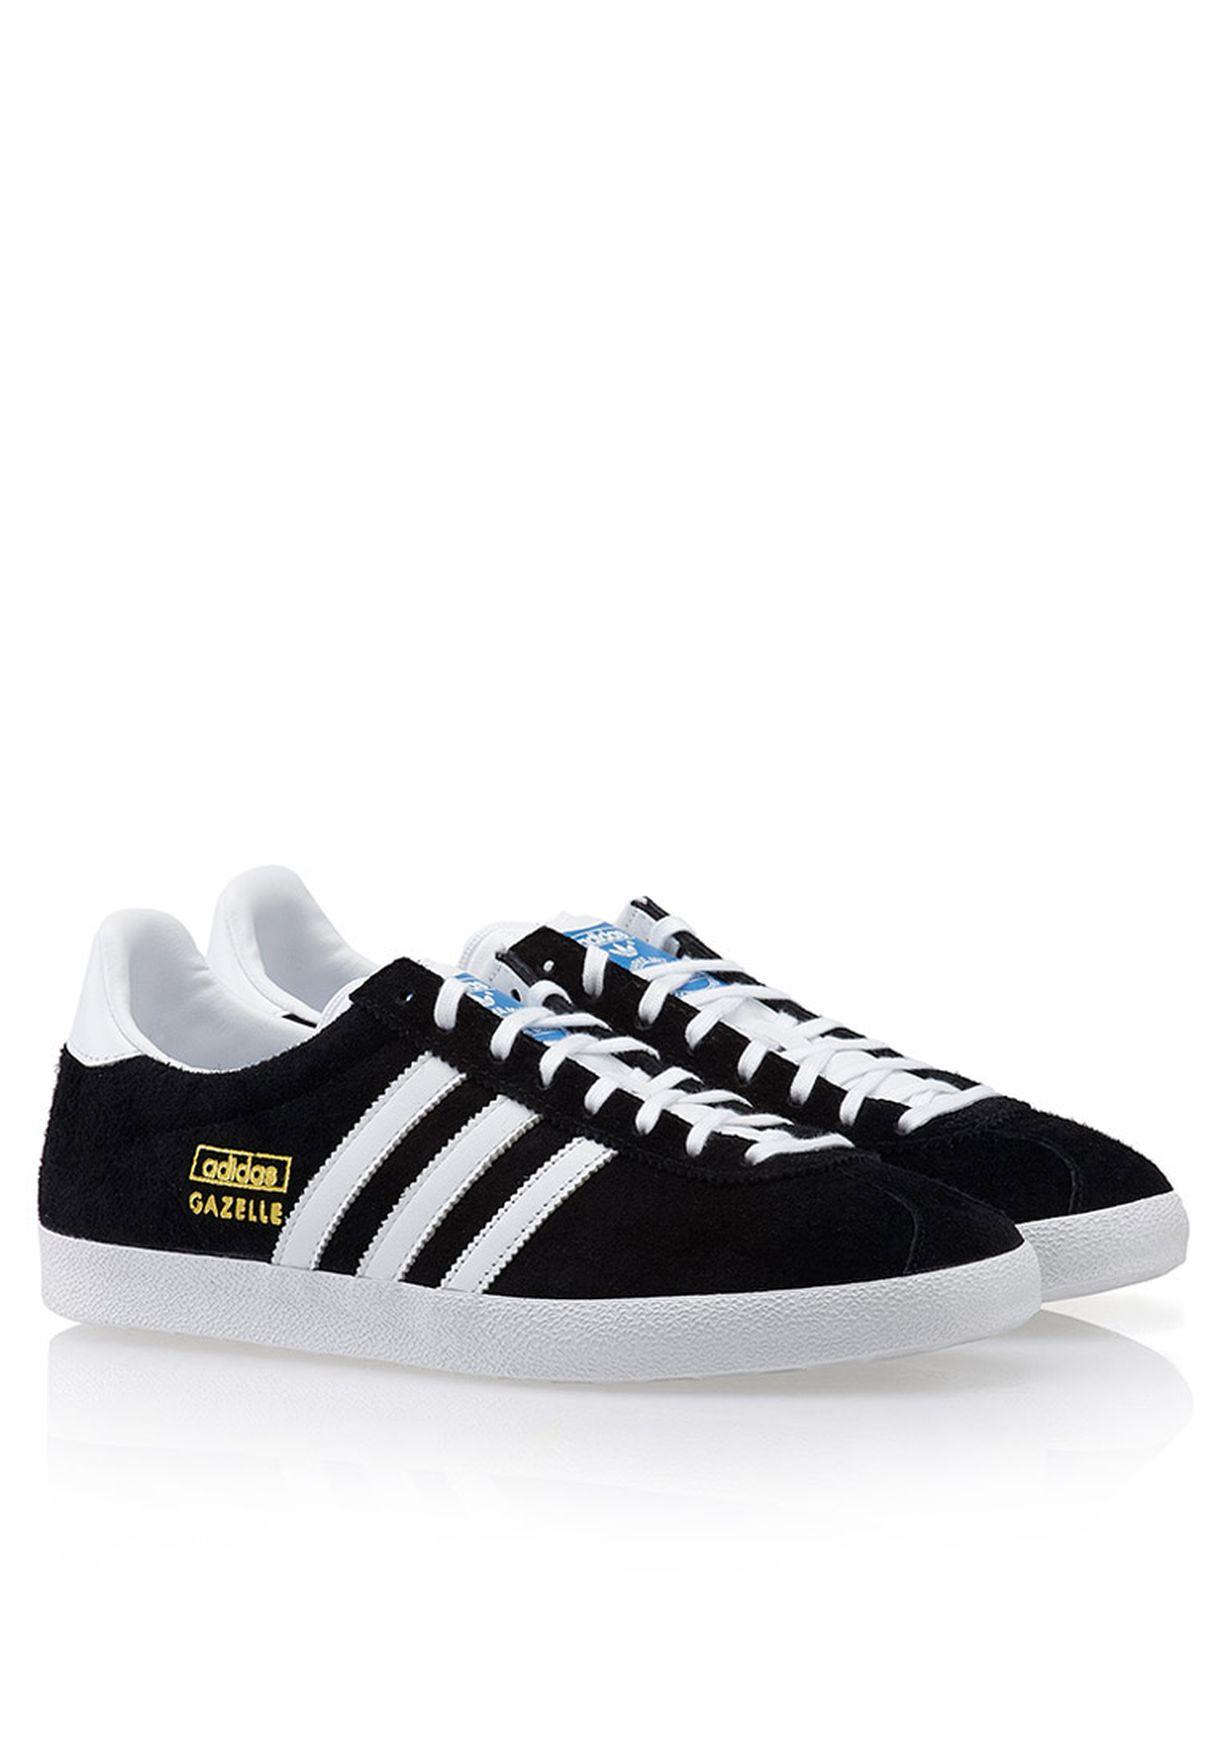 arrebatar guirnalda Hermano  Buy adidas Originals black Gazelle OG for Men in Muscat, other cities |  G13265